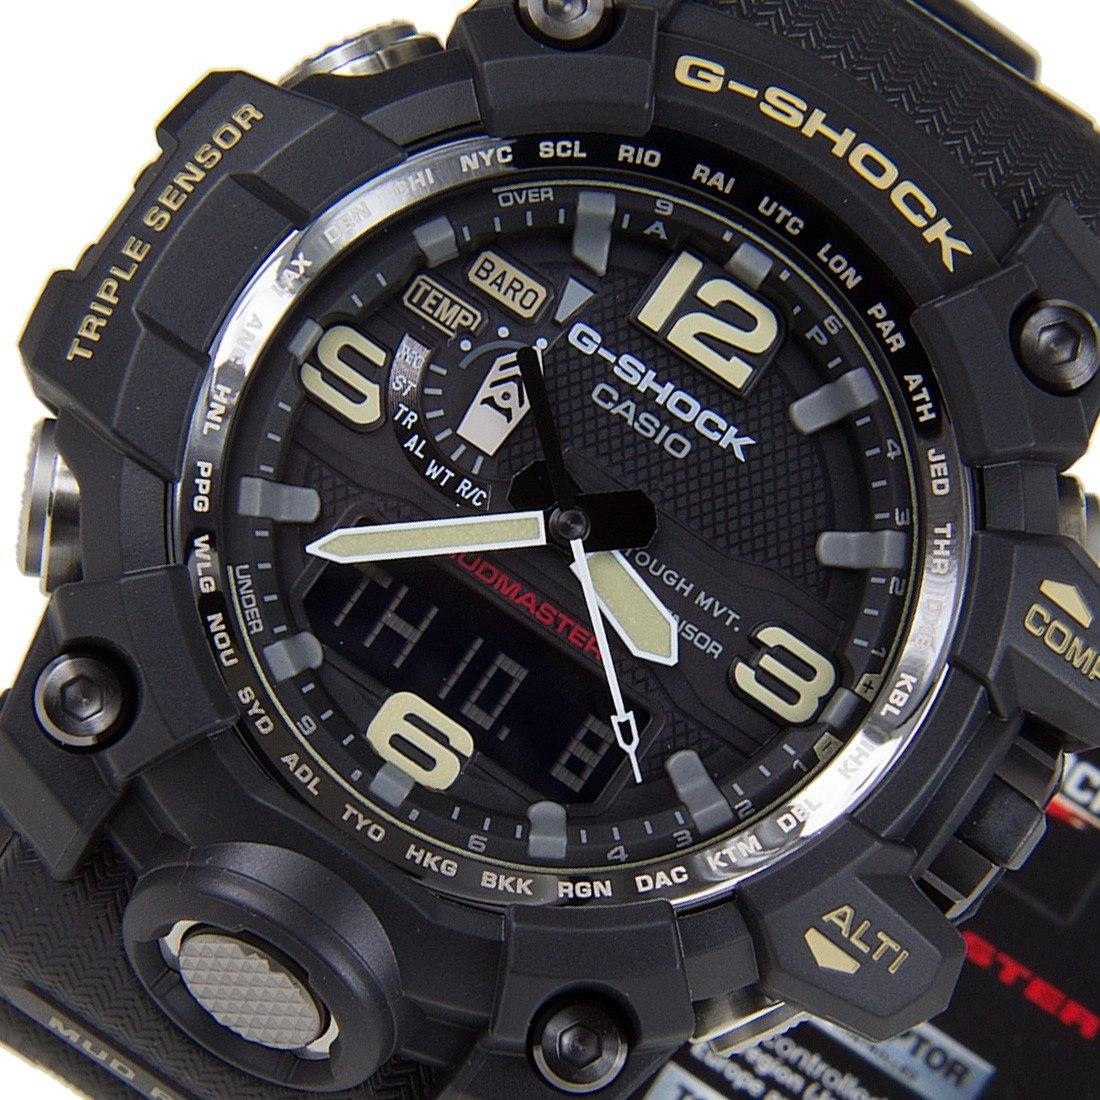 8db0d701258 relógio casio g shock gwg -1000-1adr preto mudmaster solar. Carregando zoom.